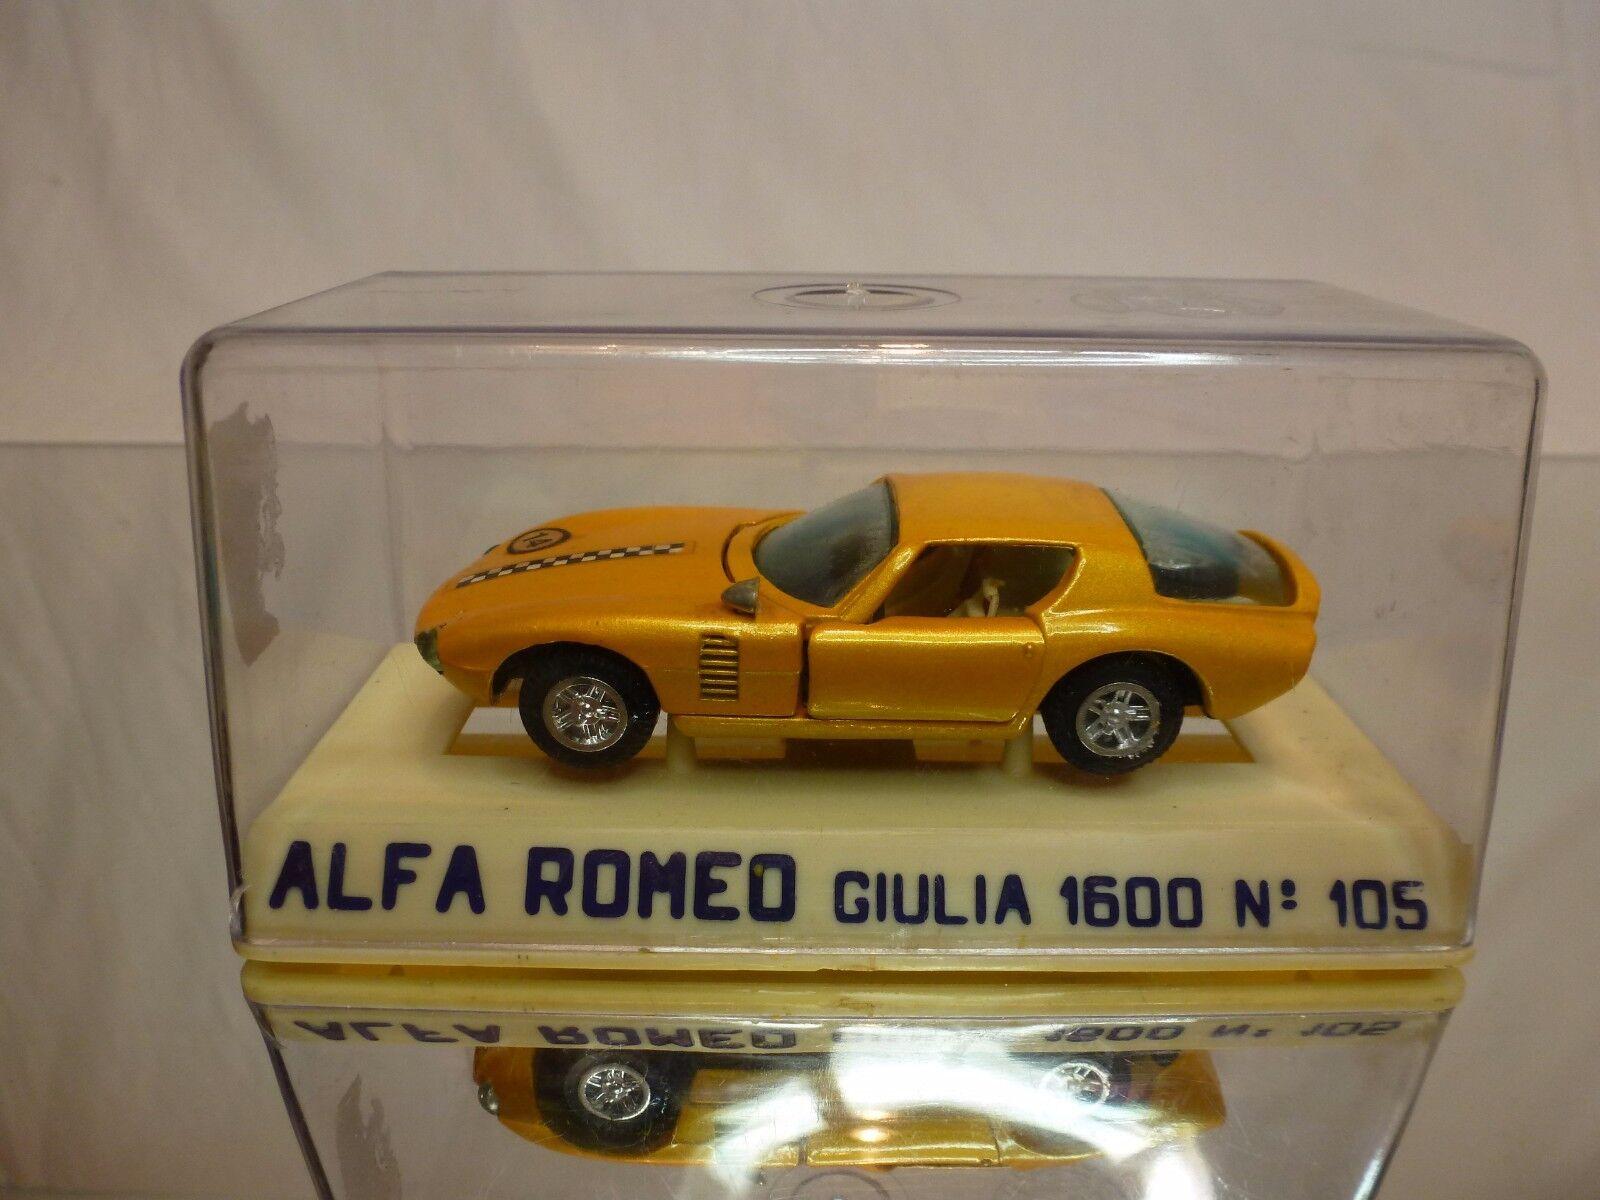 JOAL 105 ALFA ROMEO GIULIA 1600 CANGURO - METALLIC 1 43 - EXCELLENT IN BOX